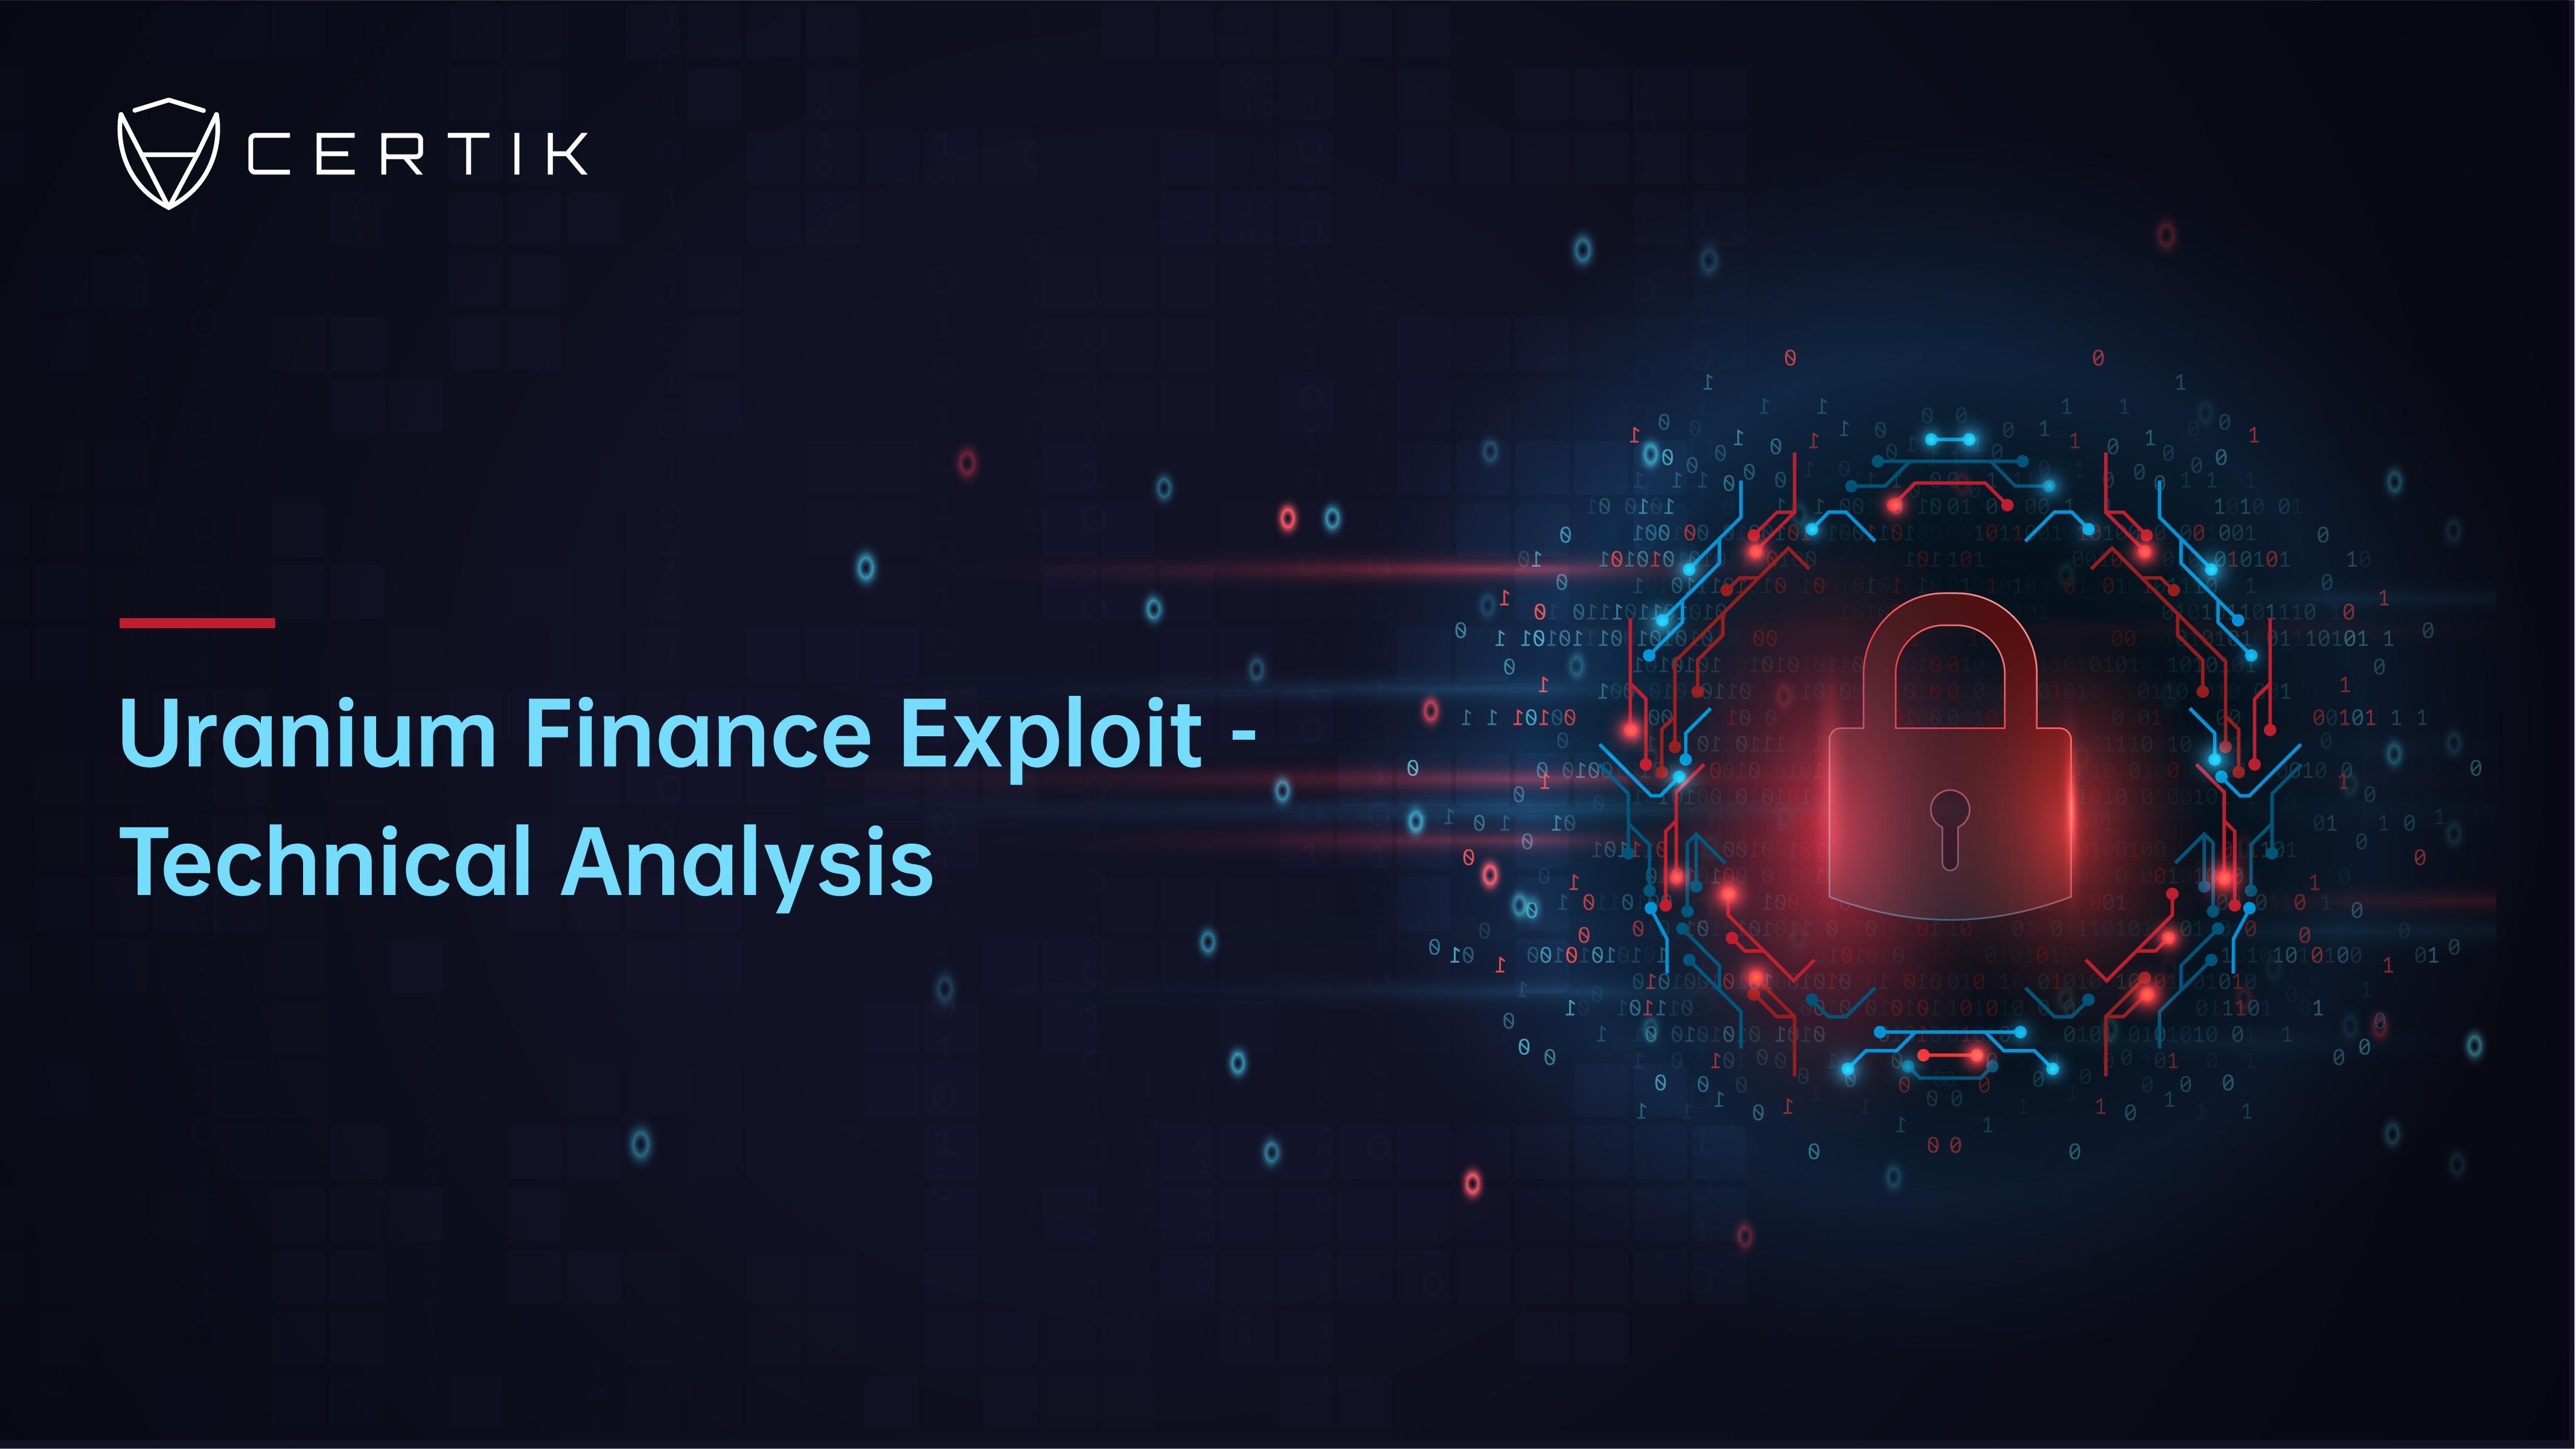 Uranium Finance Exploit - Technical Analysis